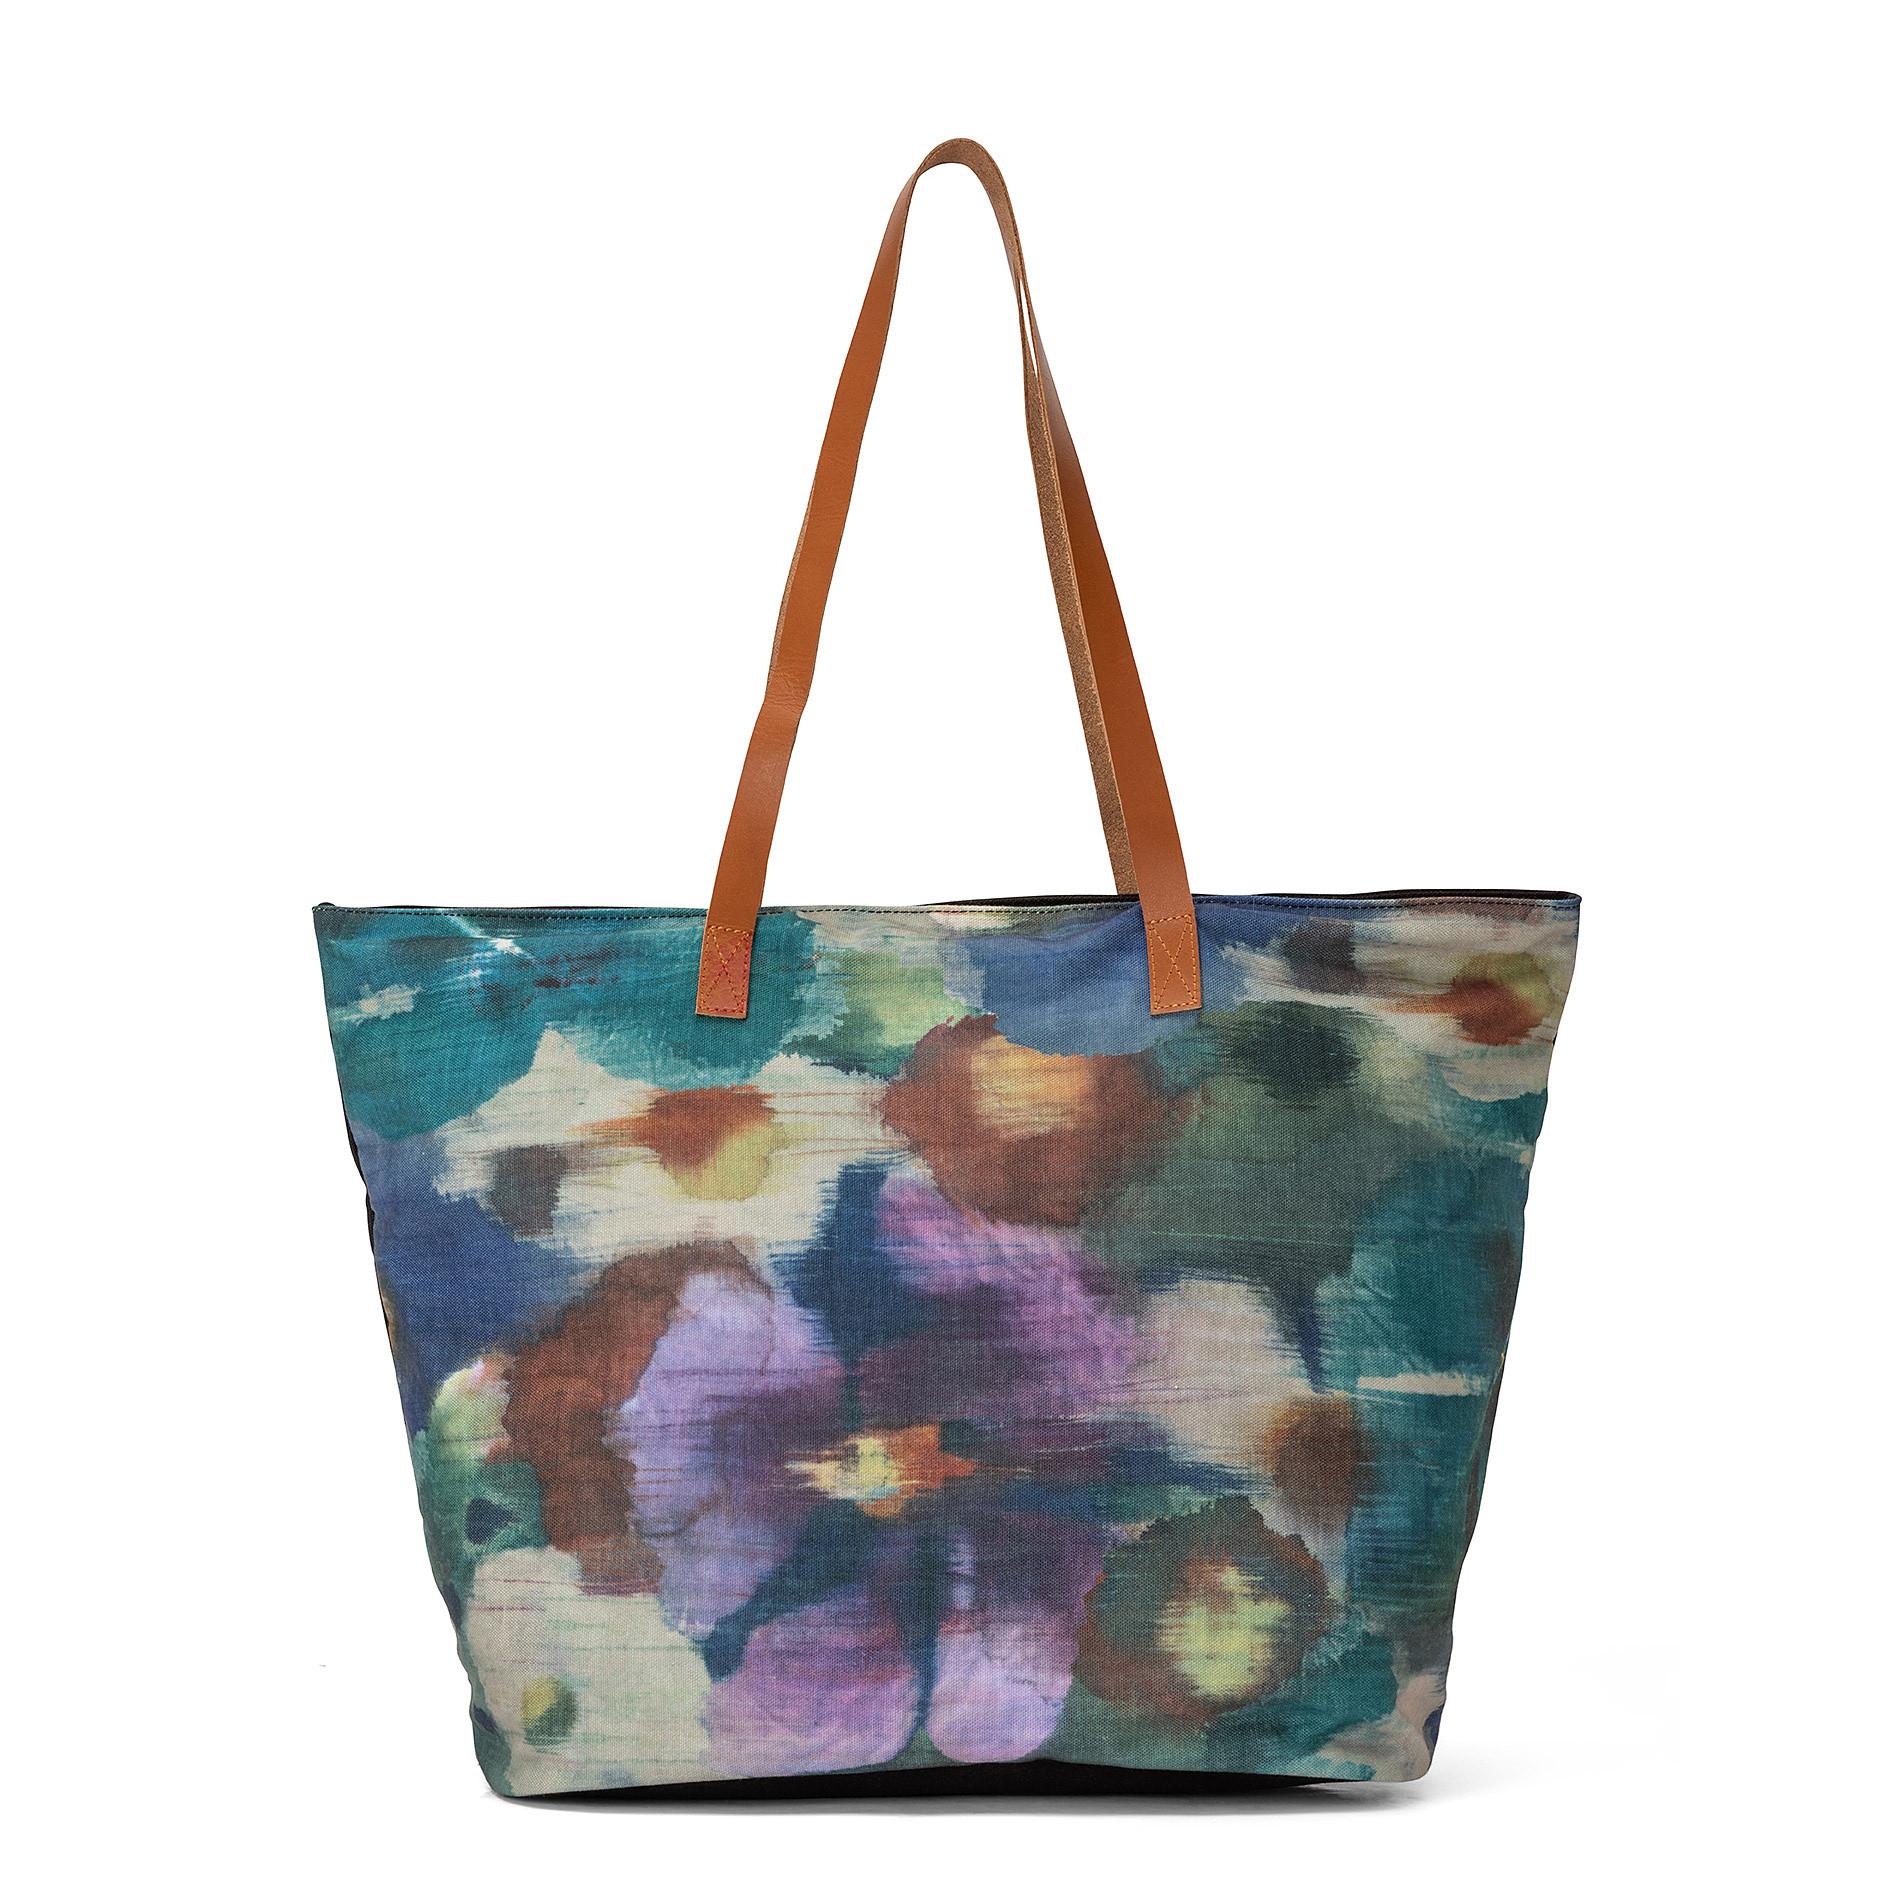 Shopper stampa floreale manici in pelle, Multicolor, large image number 0